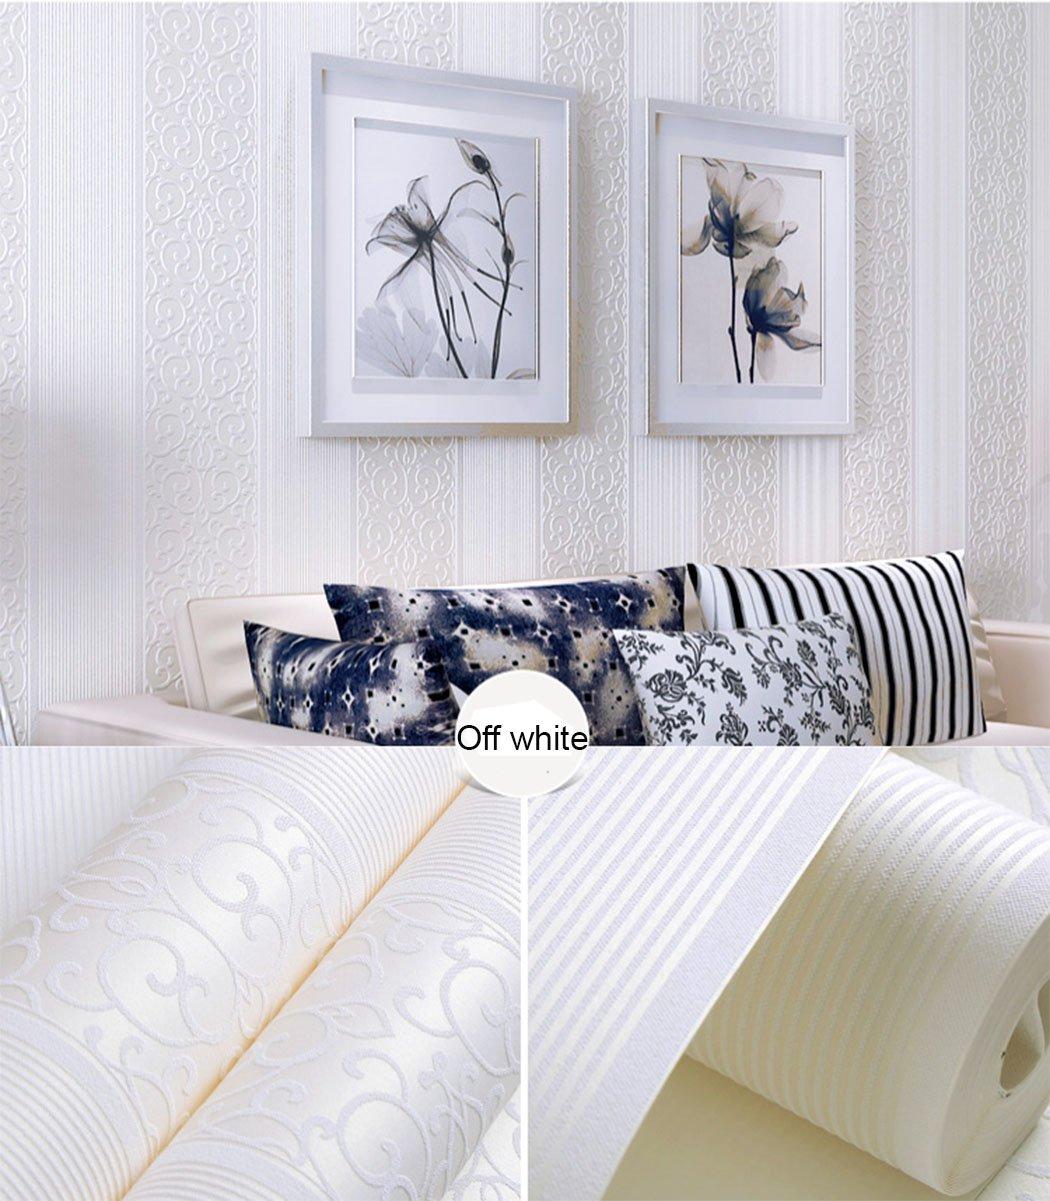 Amazon European Style Peel And Stick Wallpaper Roll Modern